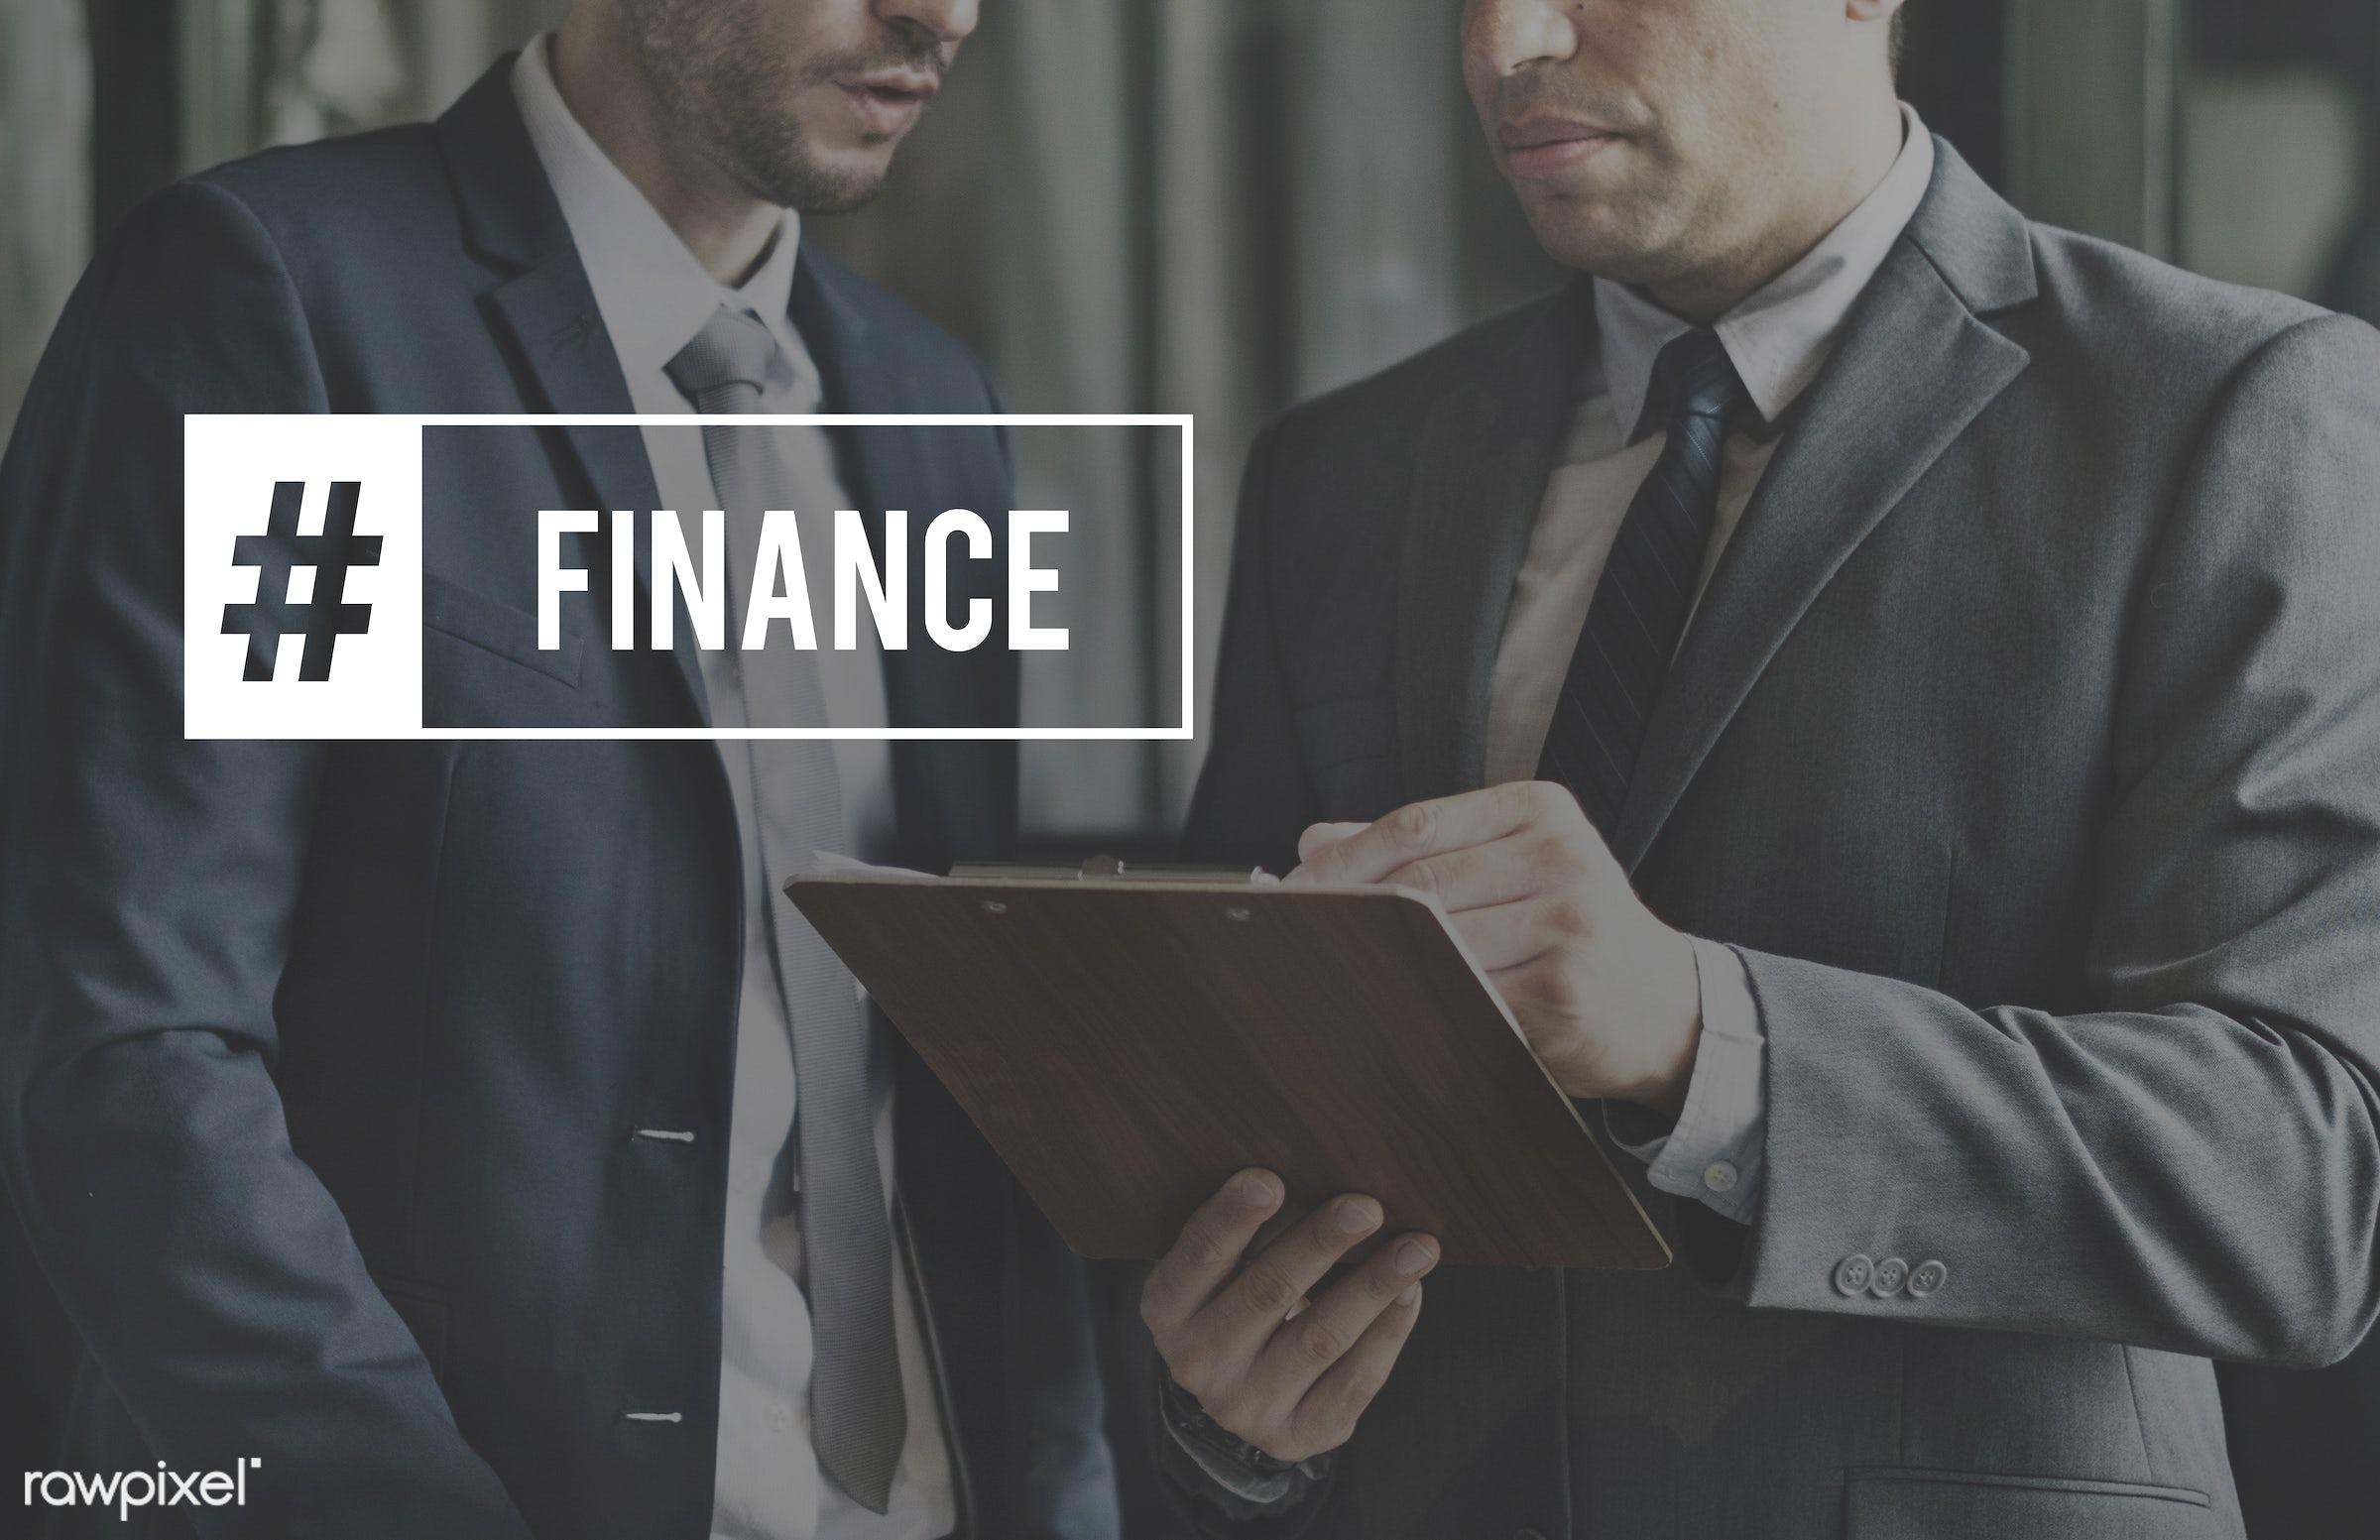 accounting, balance, banking, board, bookkeeping, budget, businessman, businessmen, caucasian, conversation, credit, debt,...